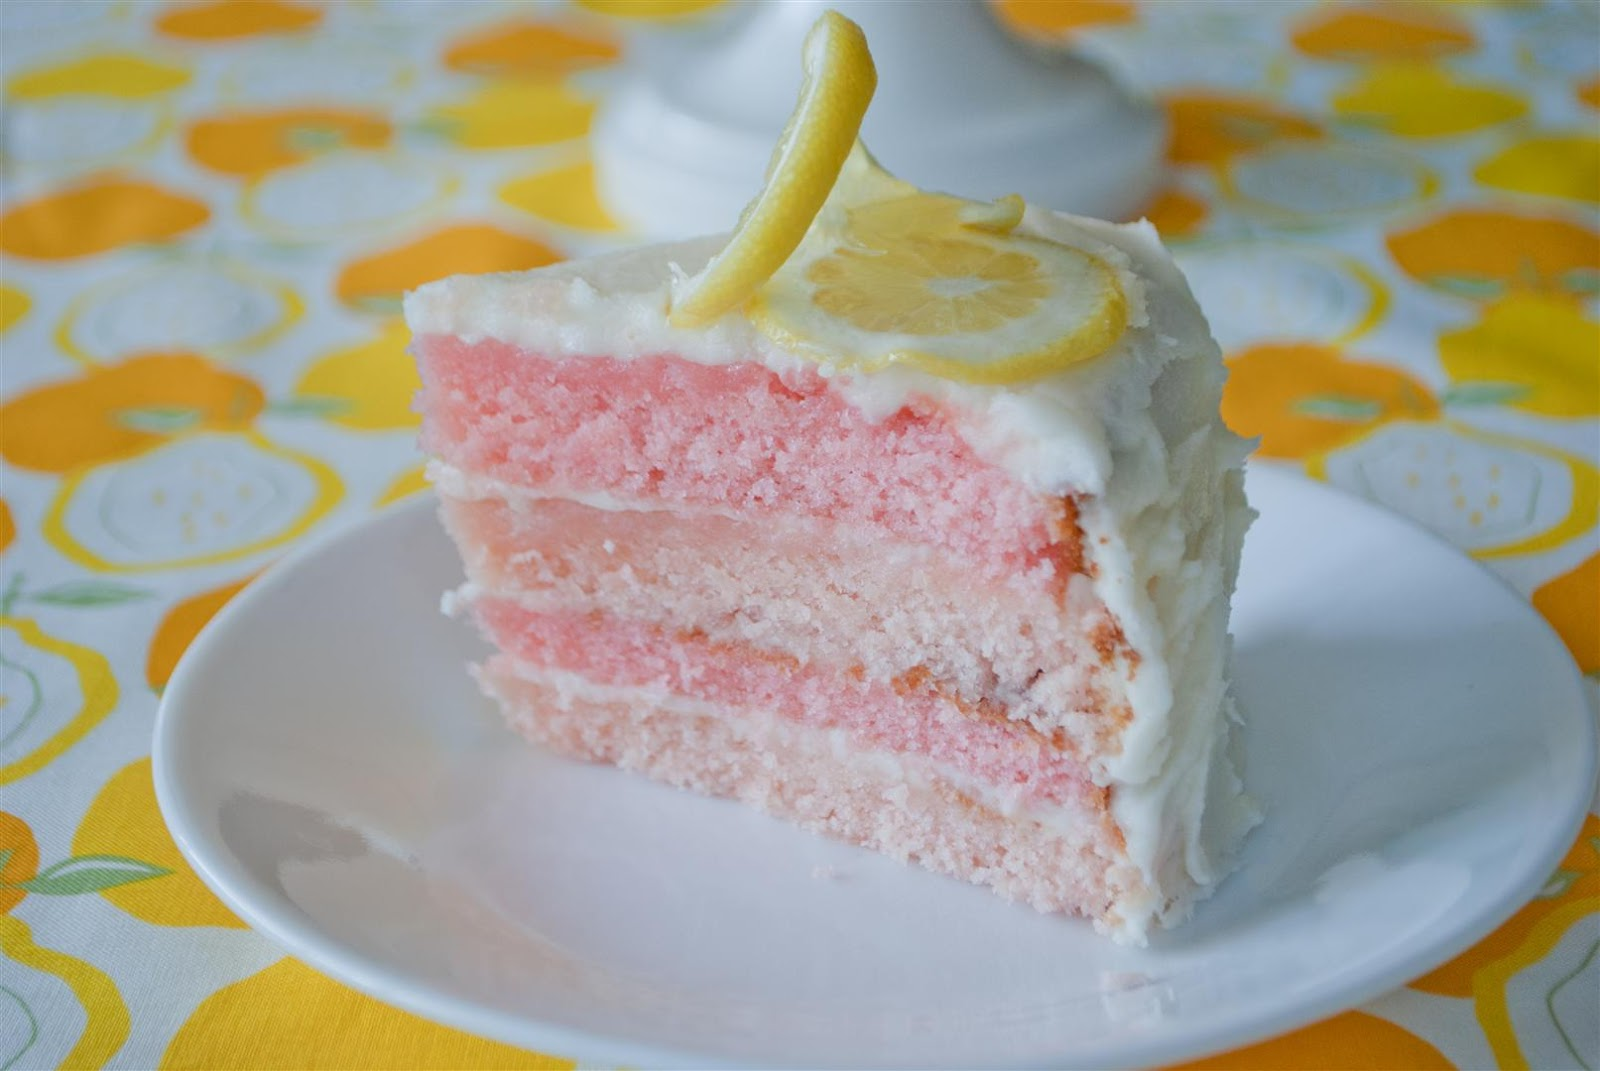 craftyc0rn3r Pink Lemonade Cake and Cupcakes